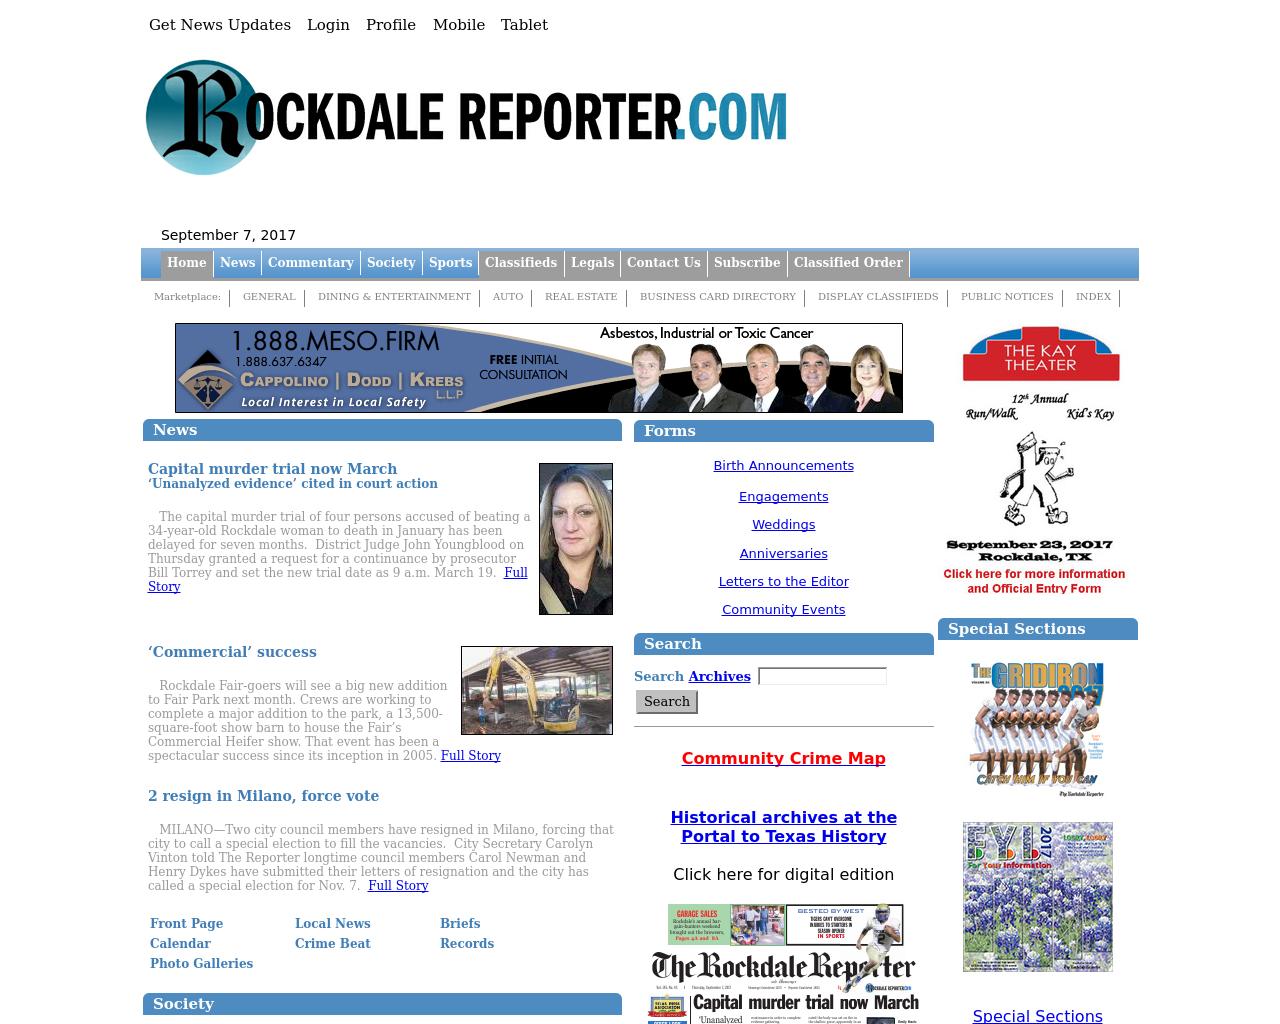 Rockdale-Reporter-Advertising-Reviews-Pricing